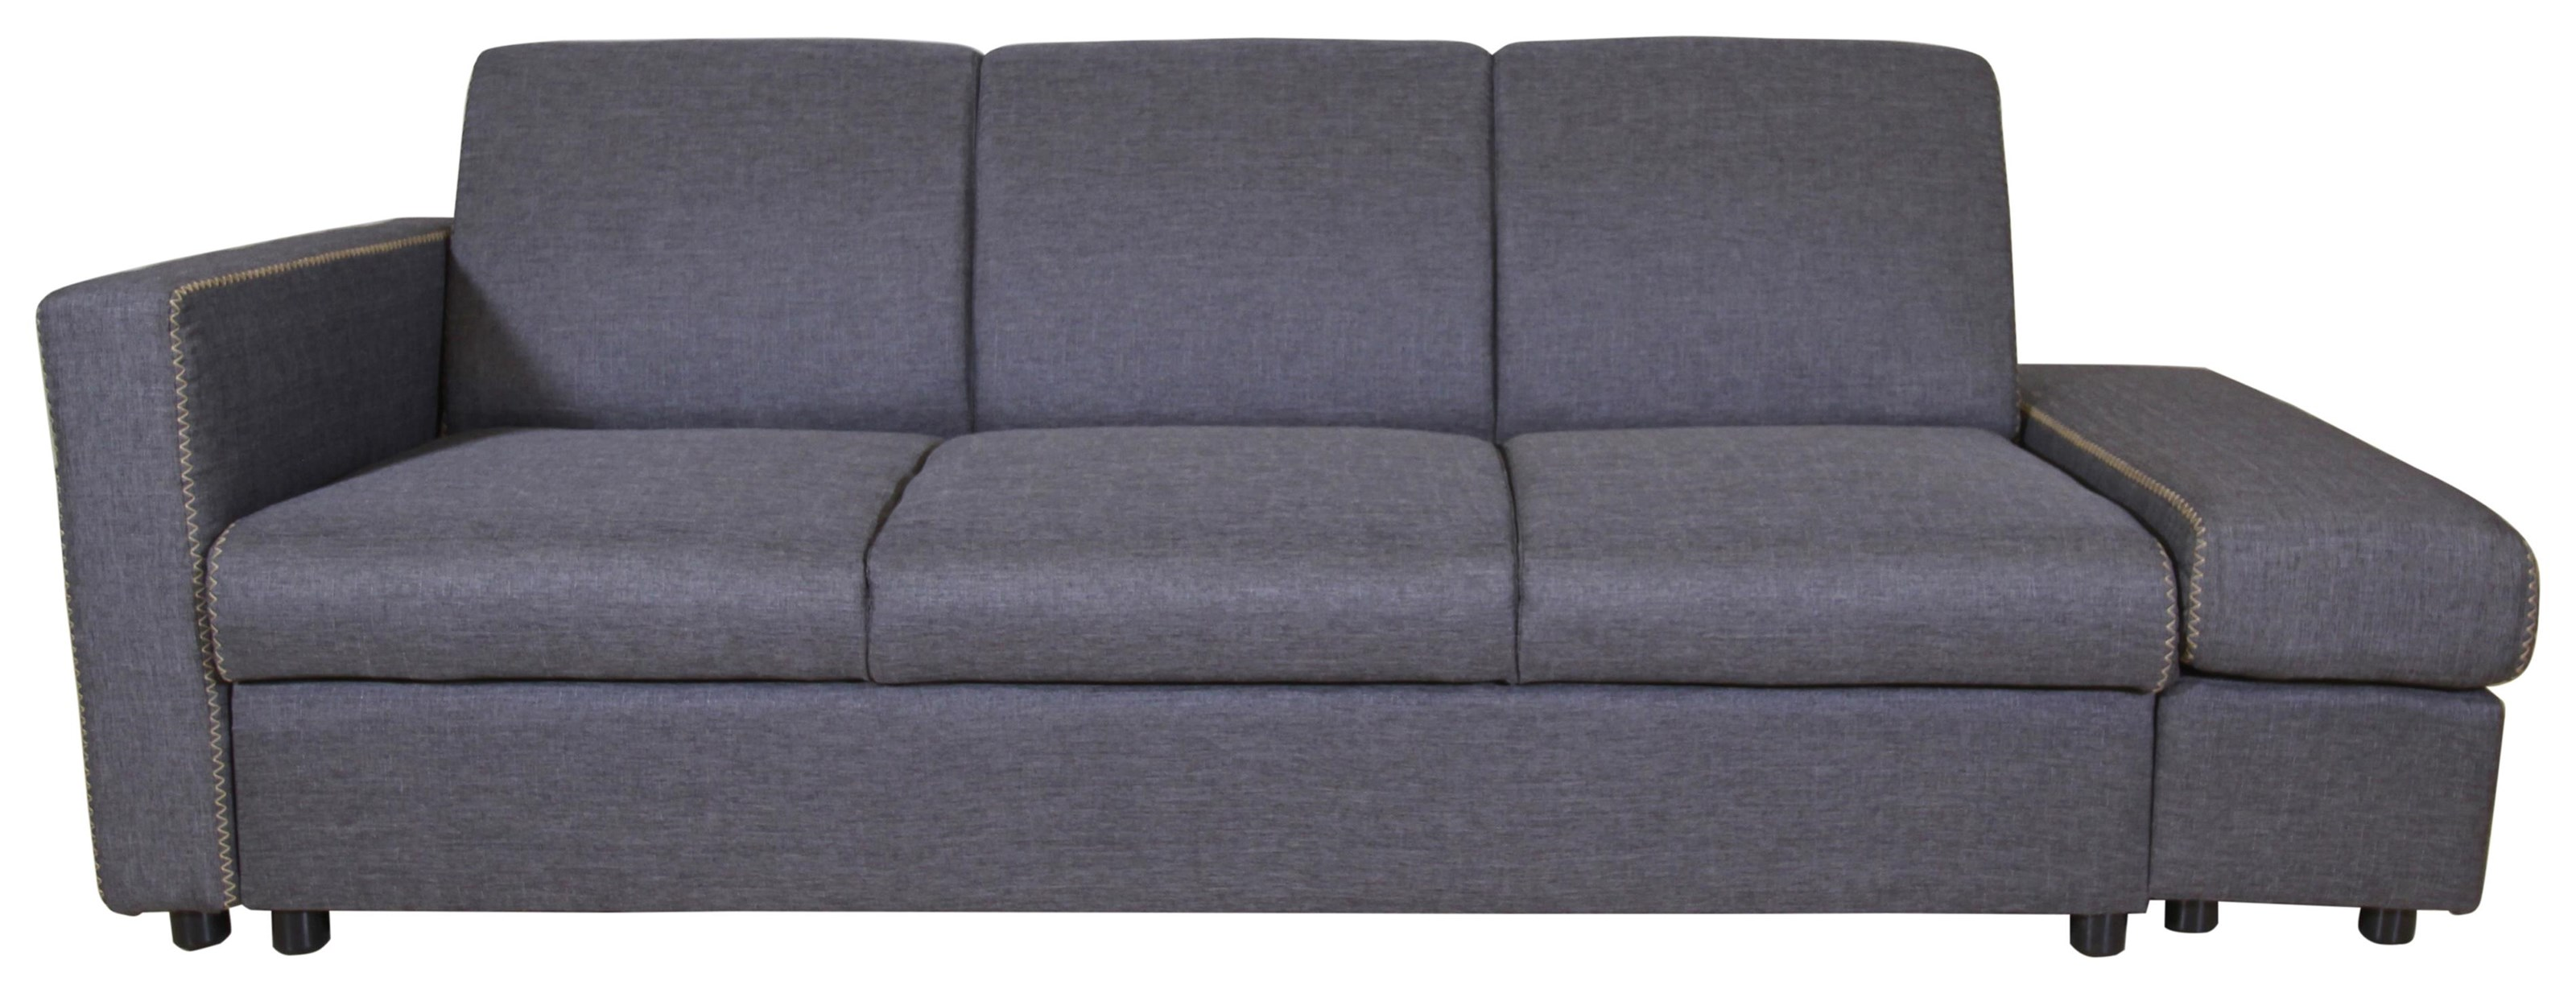 Tullia Sofabed by Kinwai USA at HomeWorld Furniture